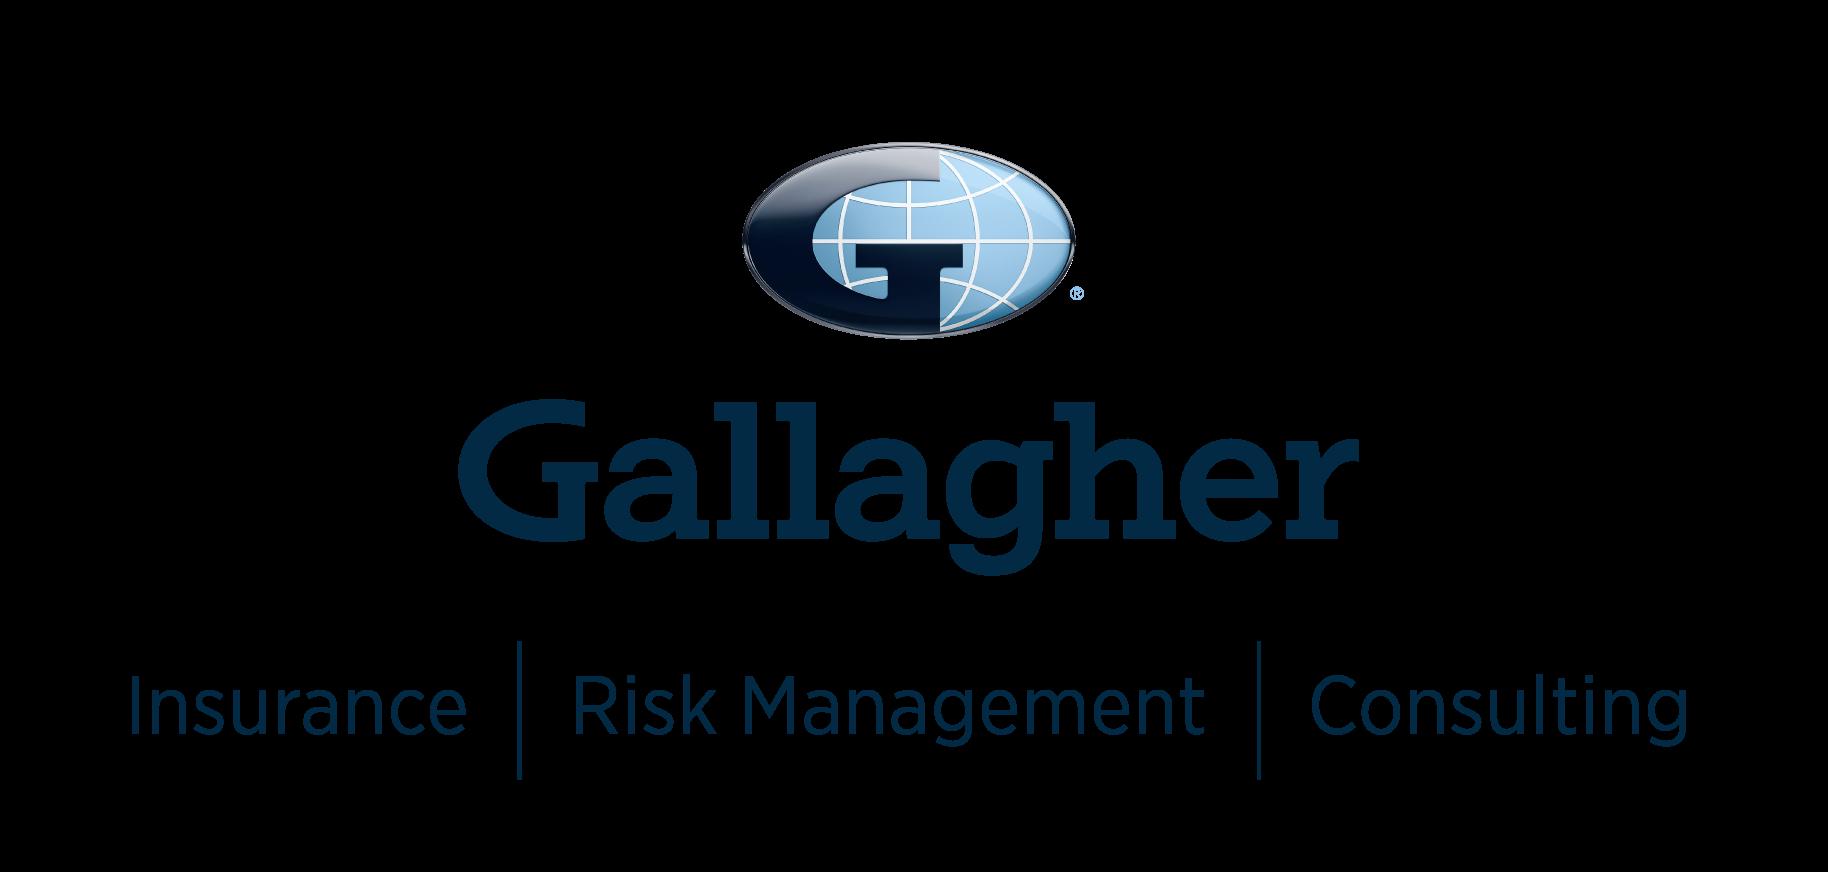 Stacked Logo - Gallagher Brand Center